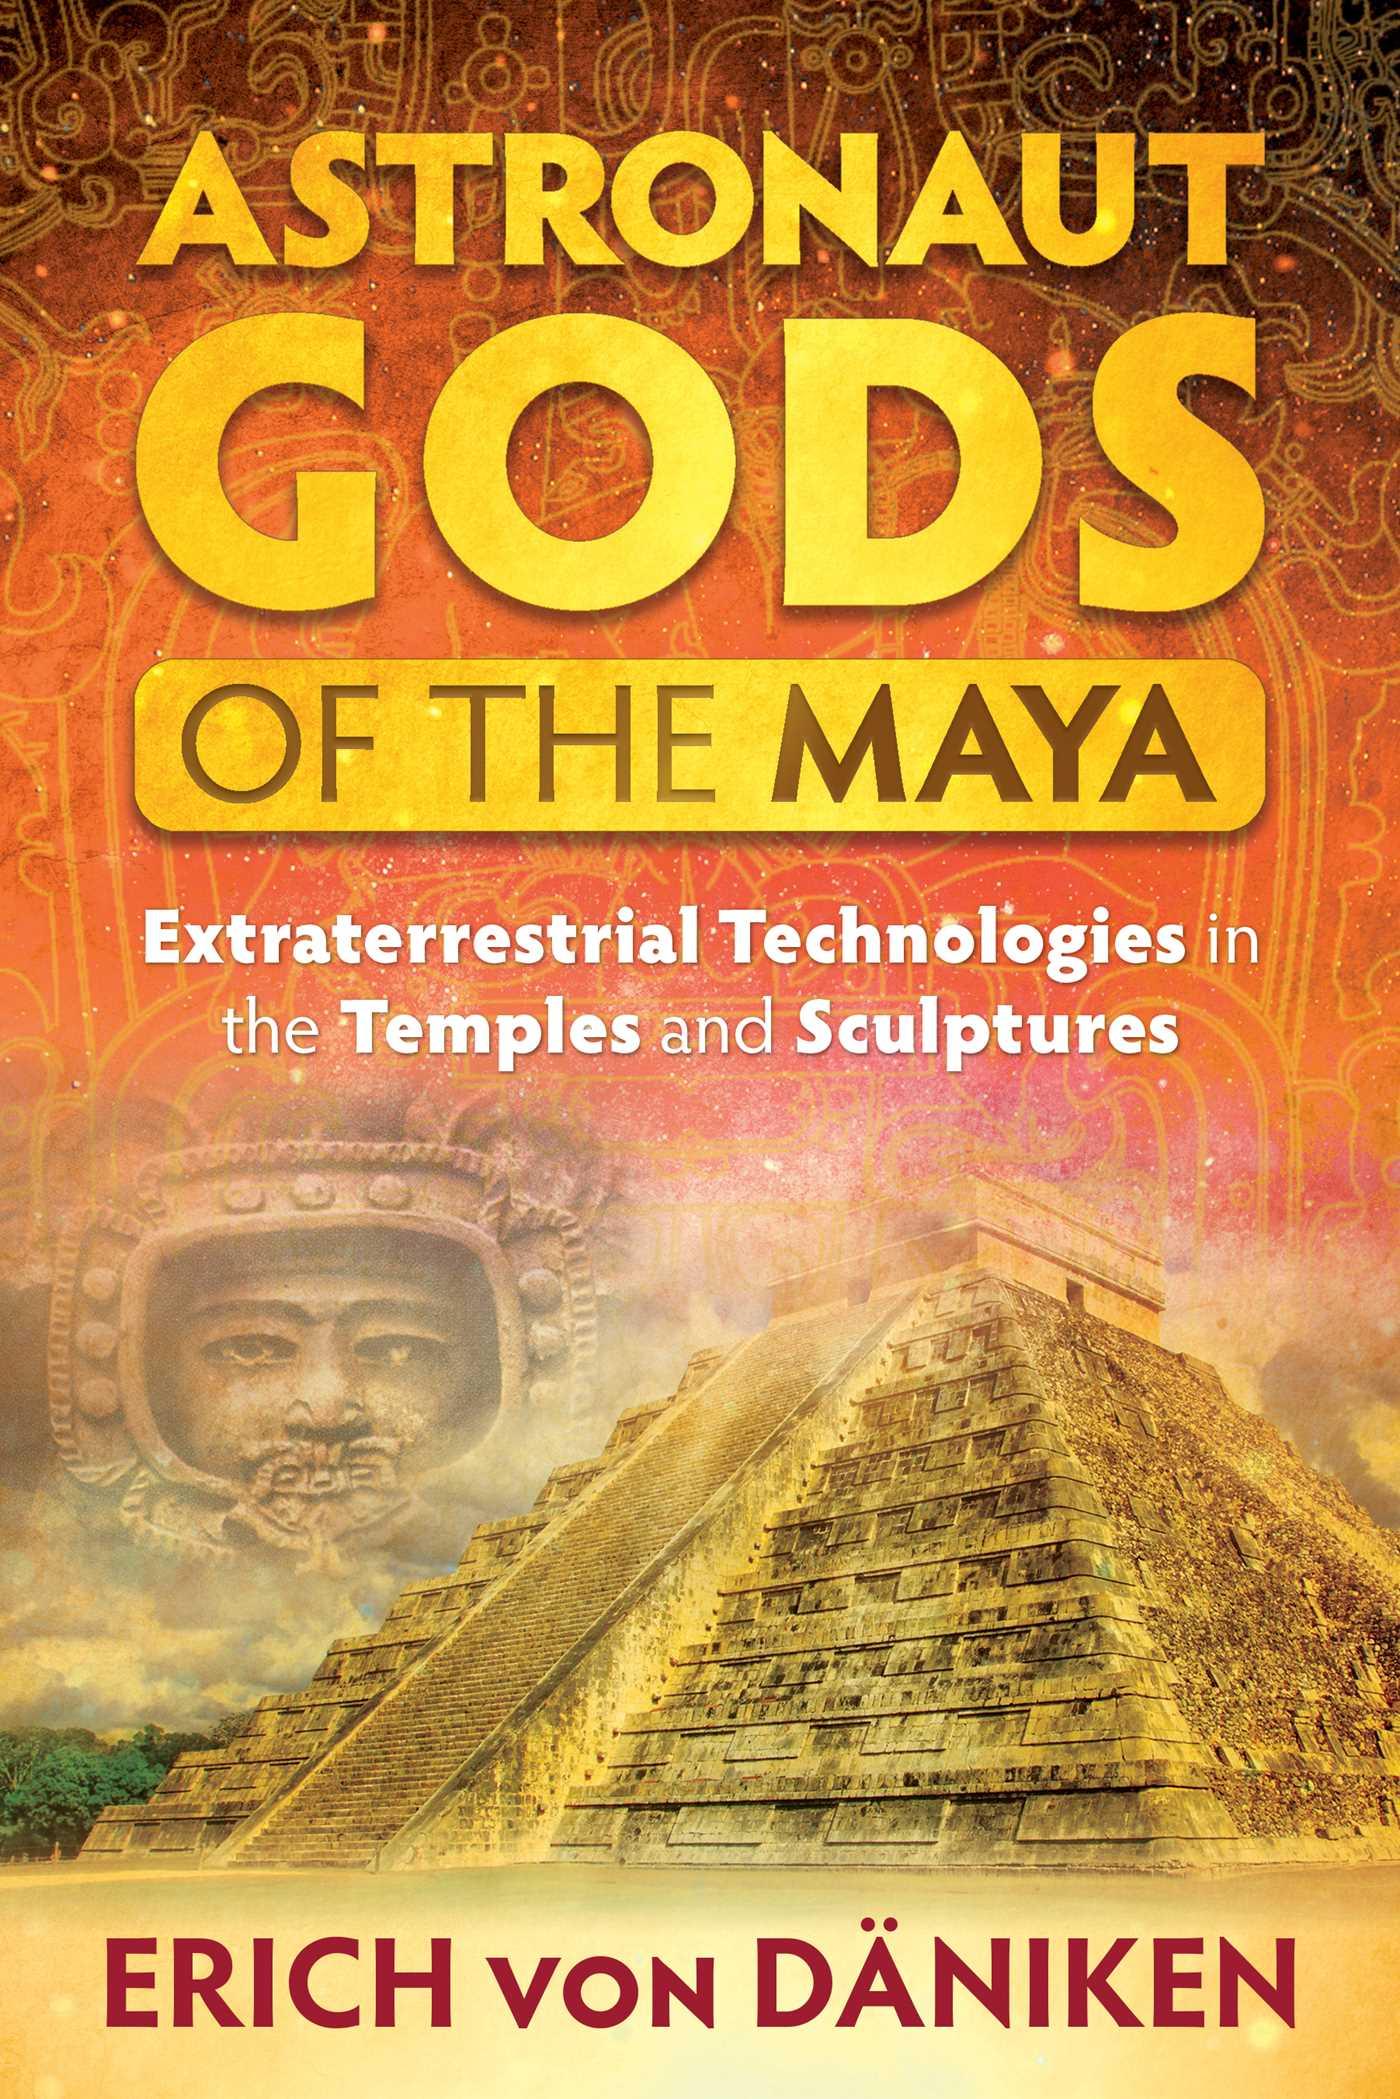 Astronaut gods of the maya 9781591432357 hr